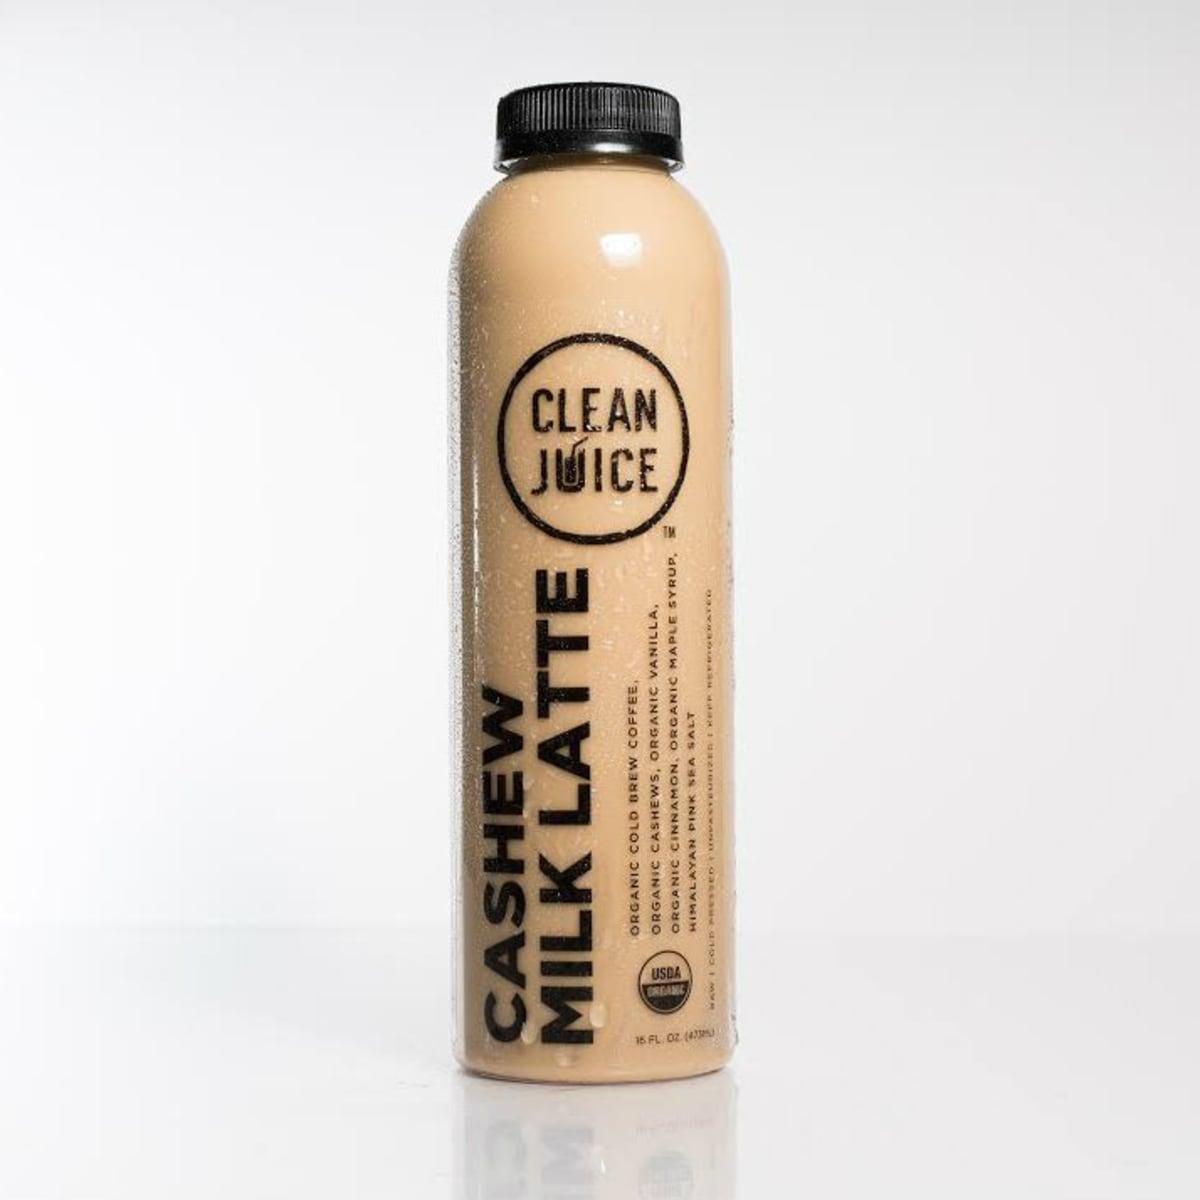 Cashew milk latte